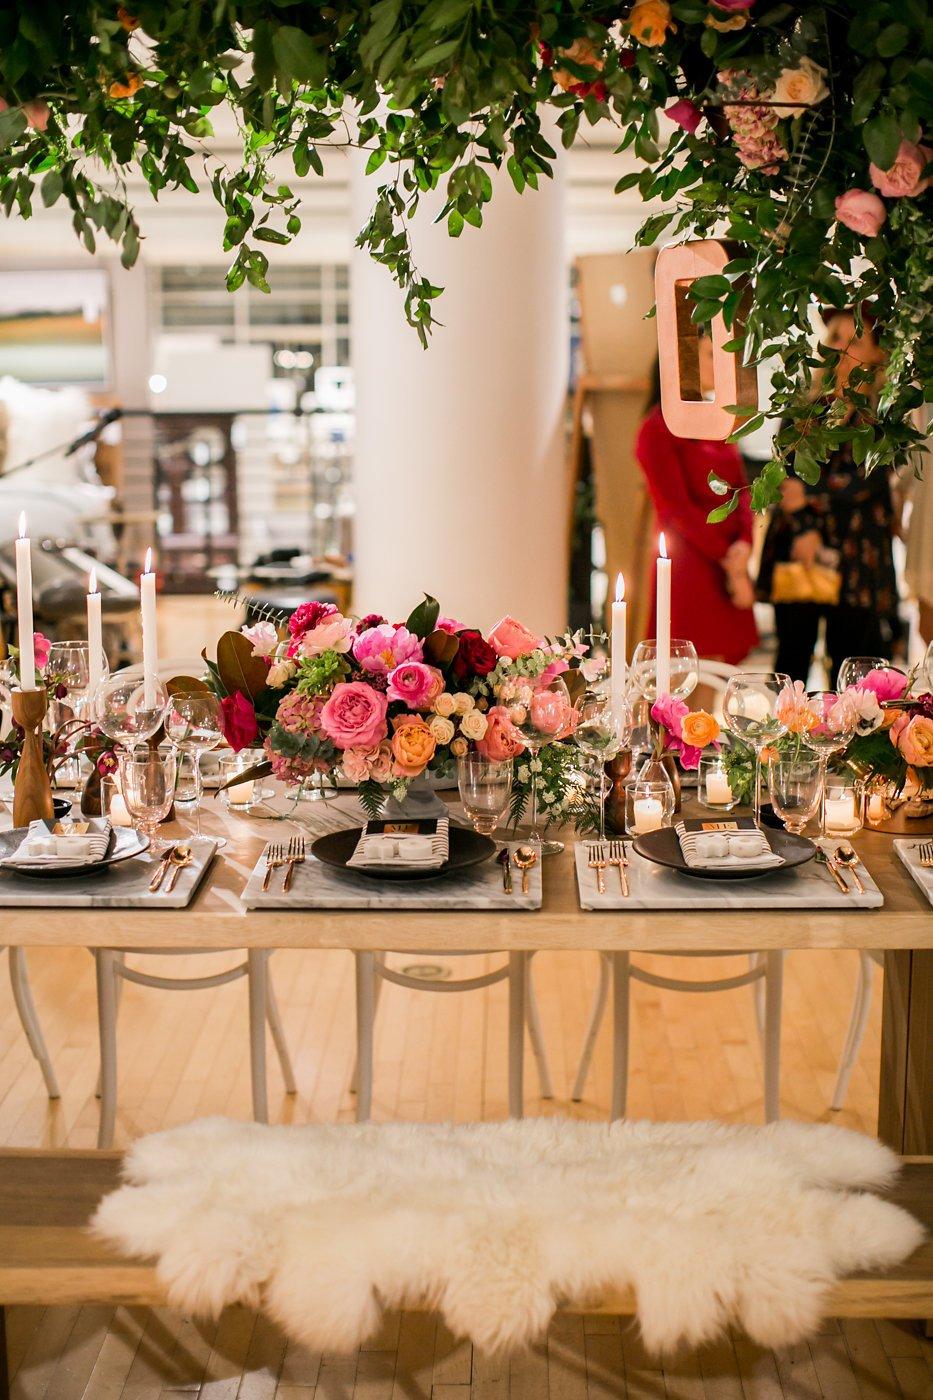 Valentine's Day table under floral arrangement